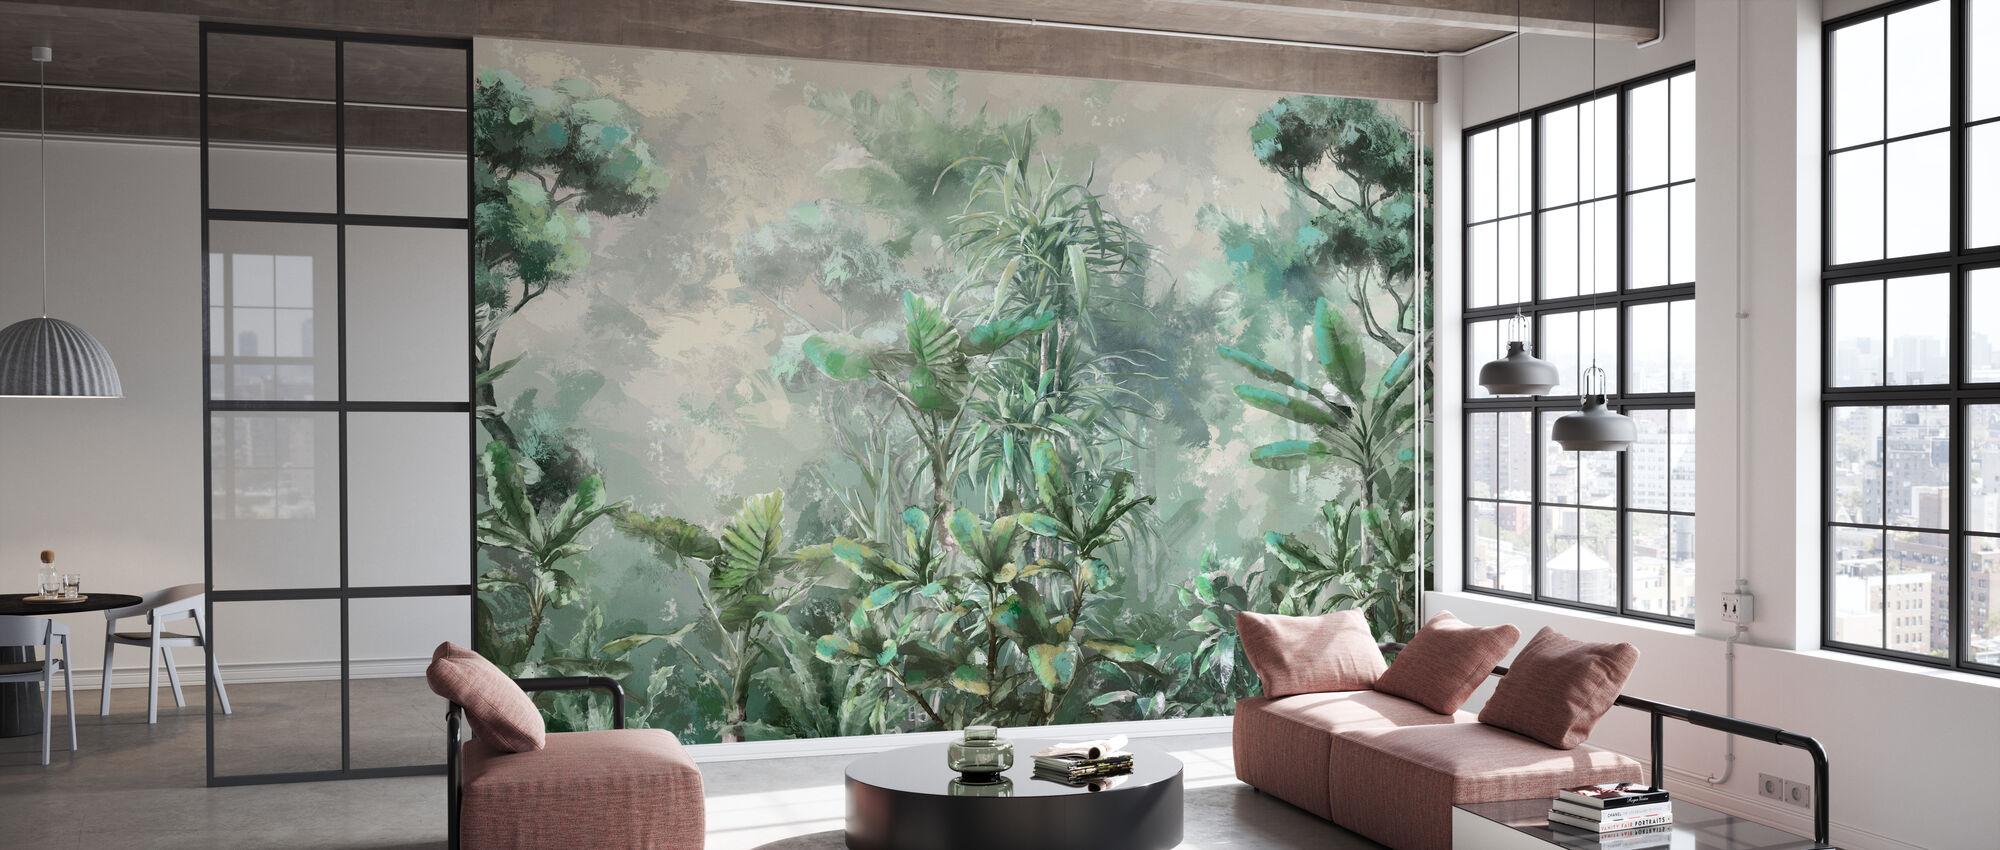 Jungle Mist - Wallpaper - Office